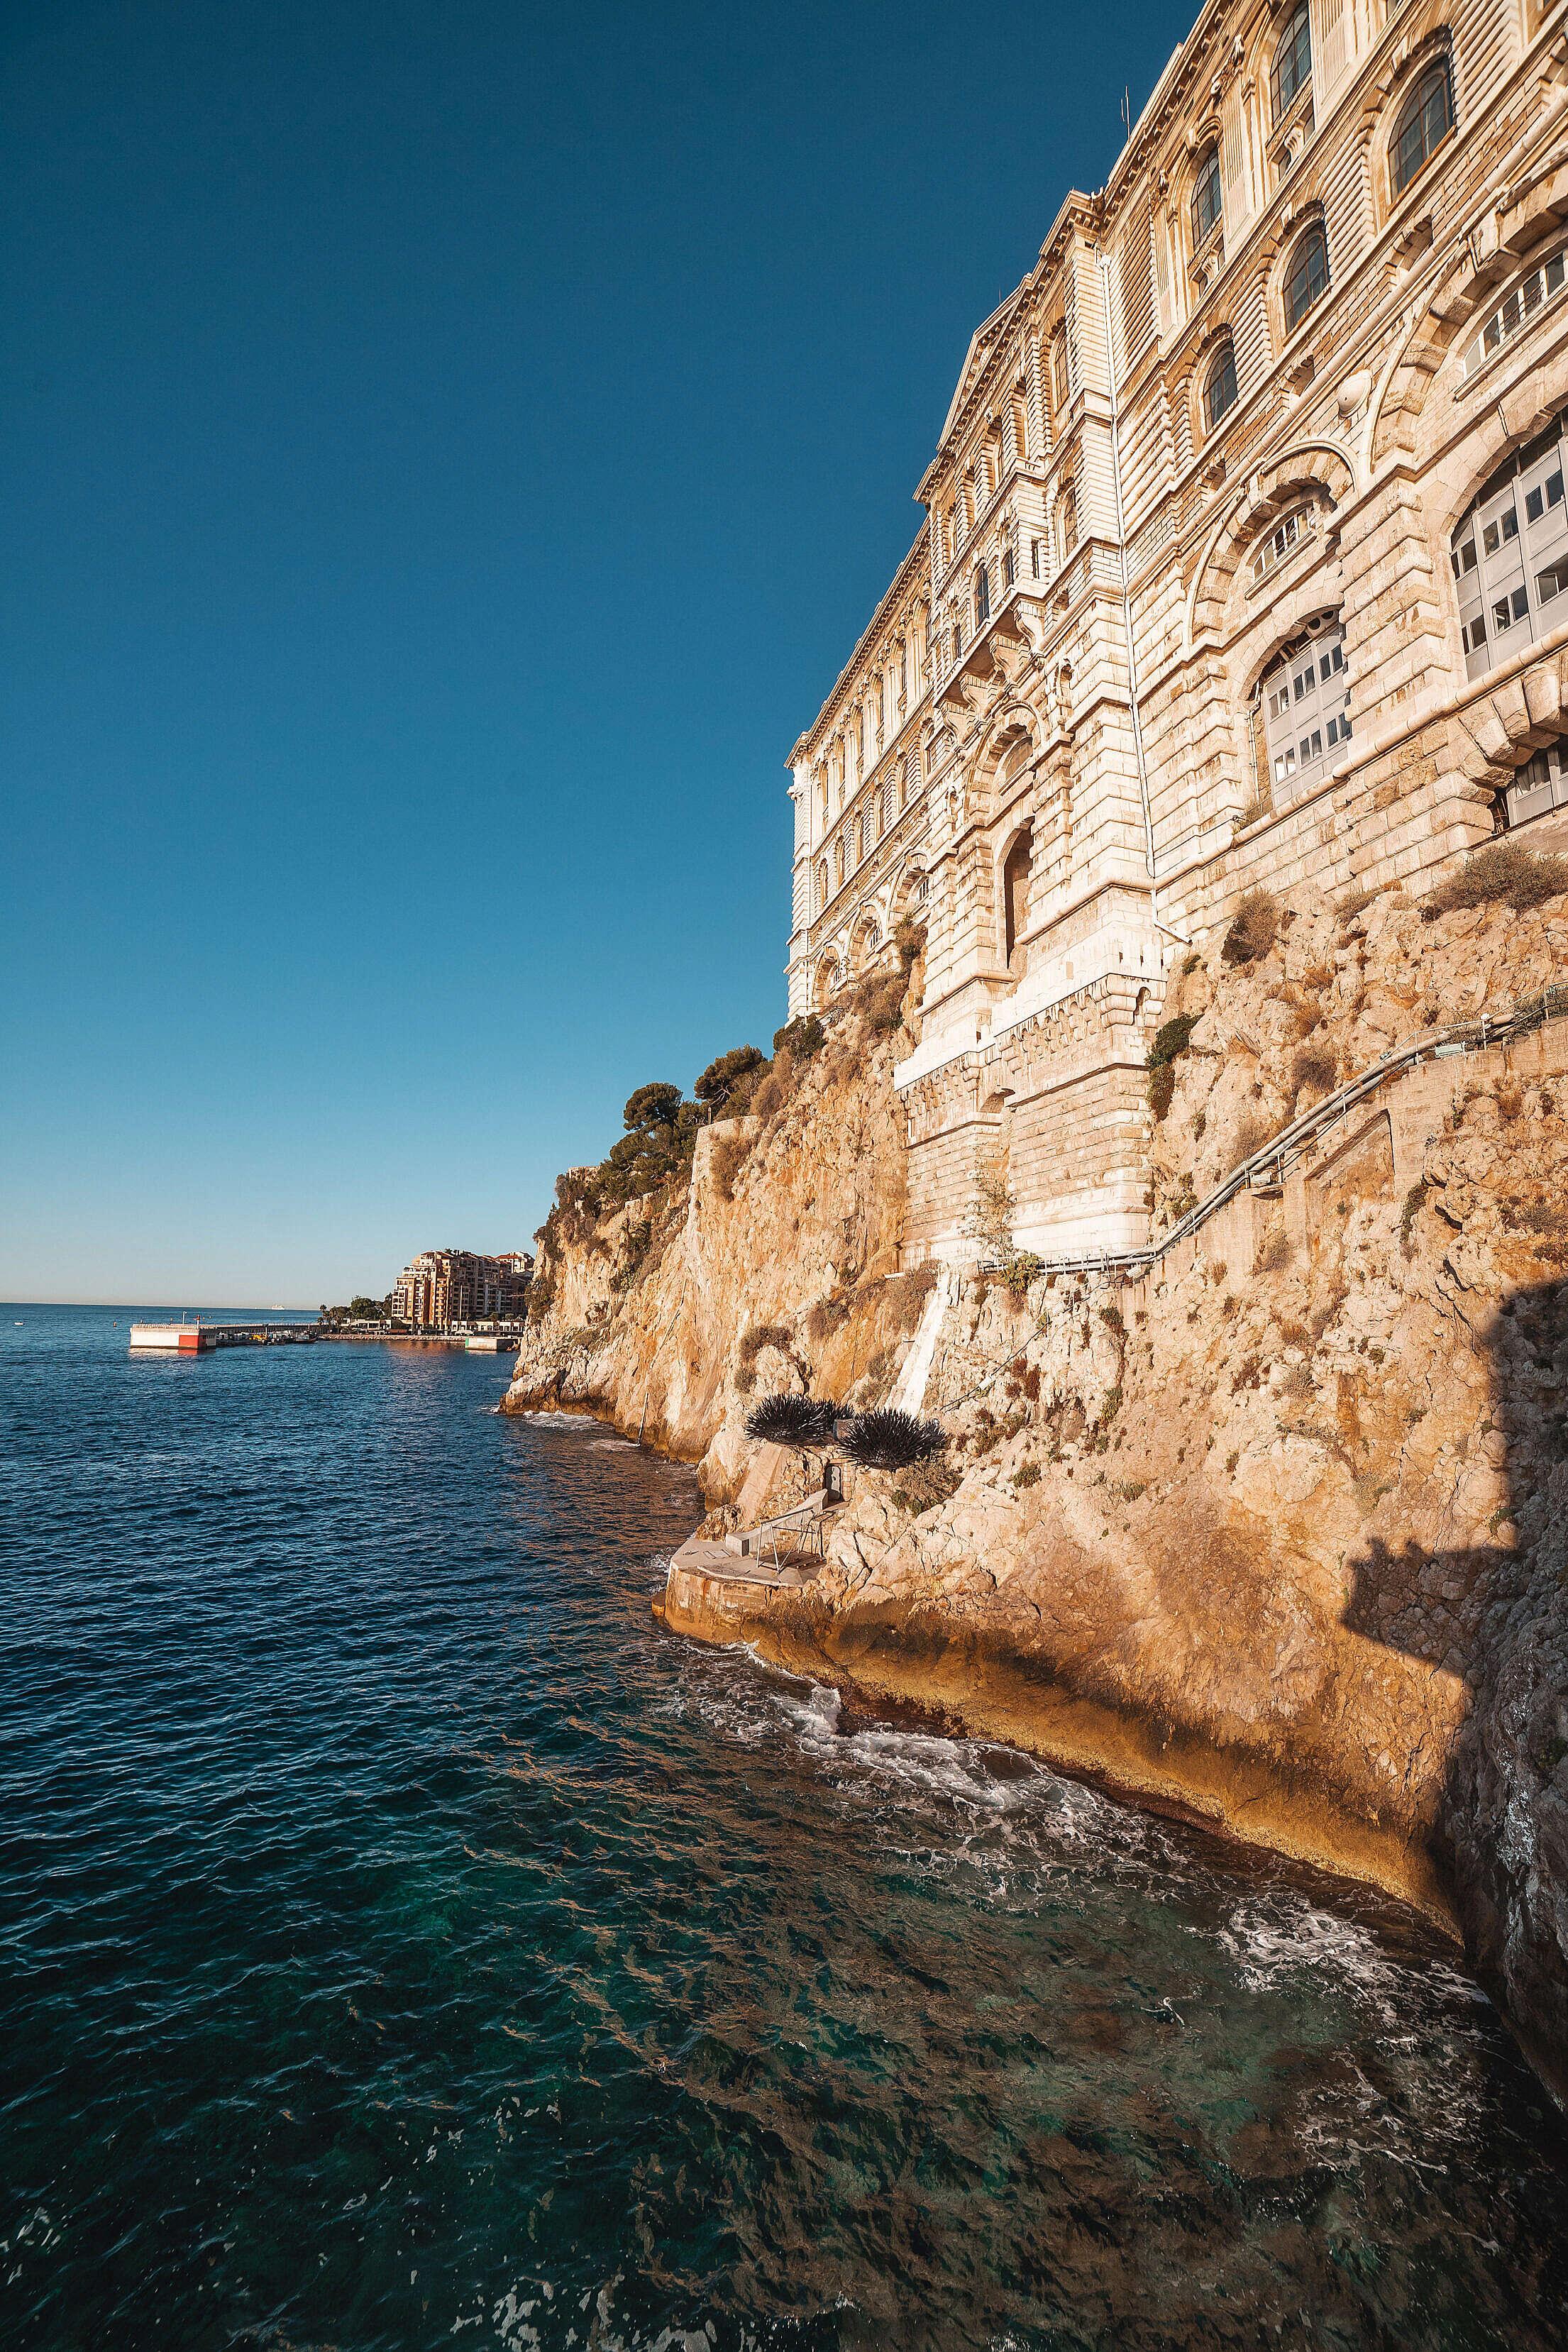 Monaco Oceanographic Museum with Artificial Sea Urchins Free Stock Photo